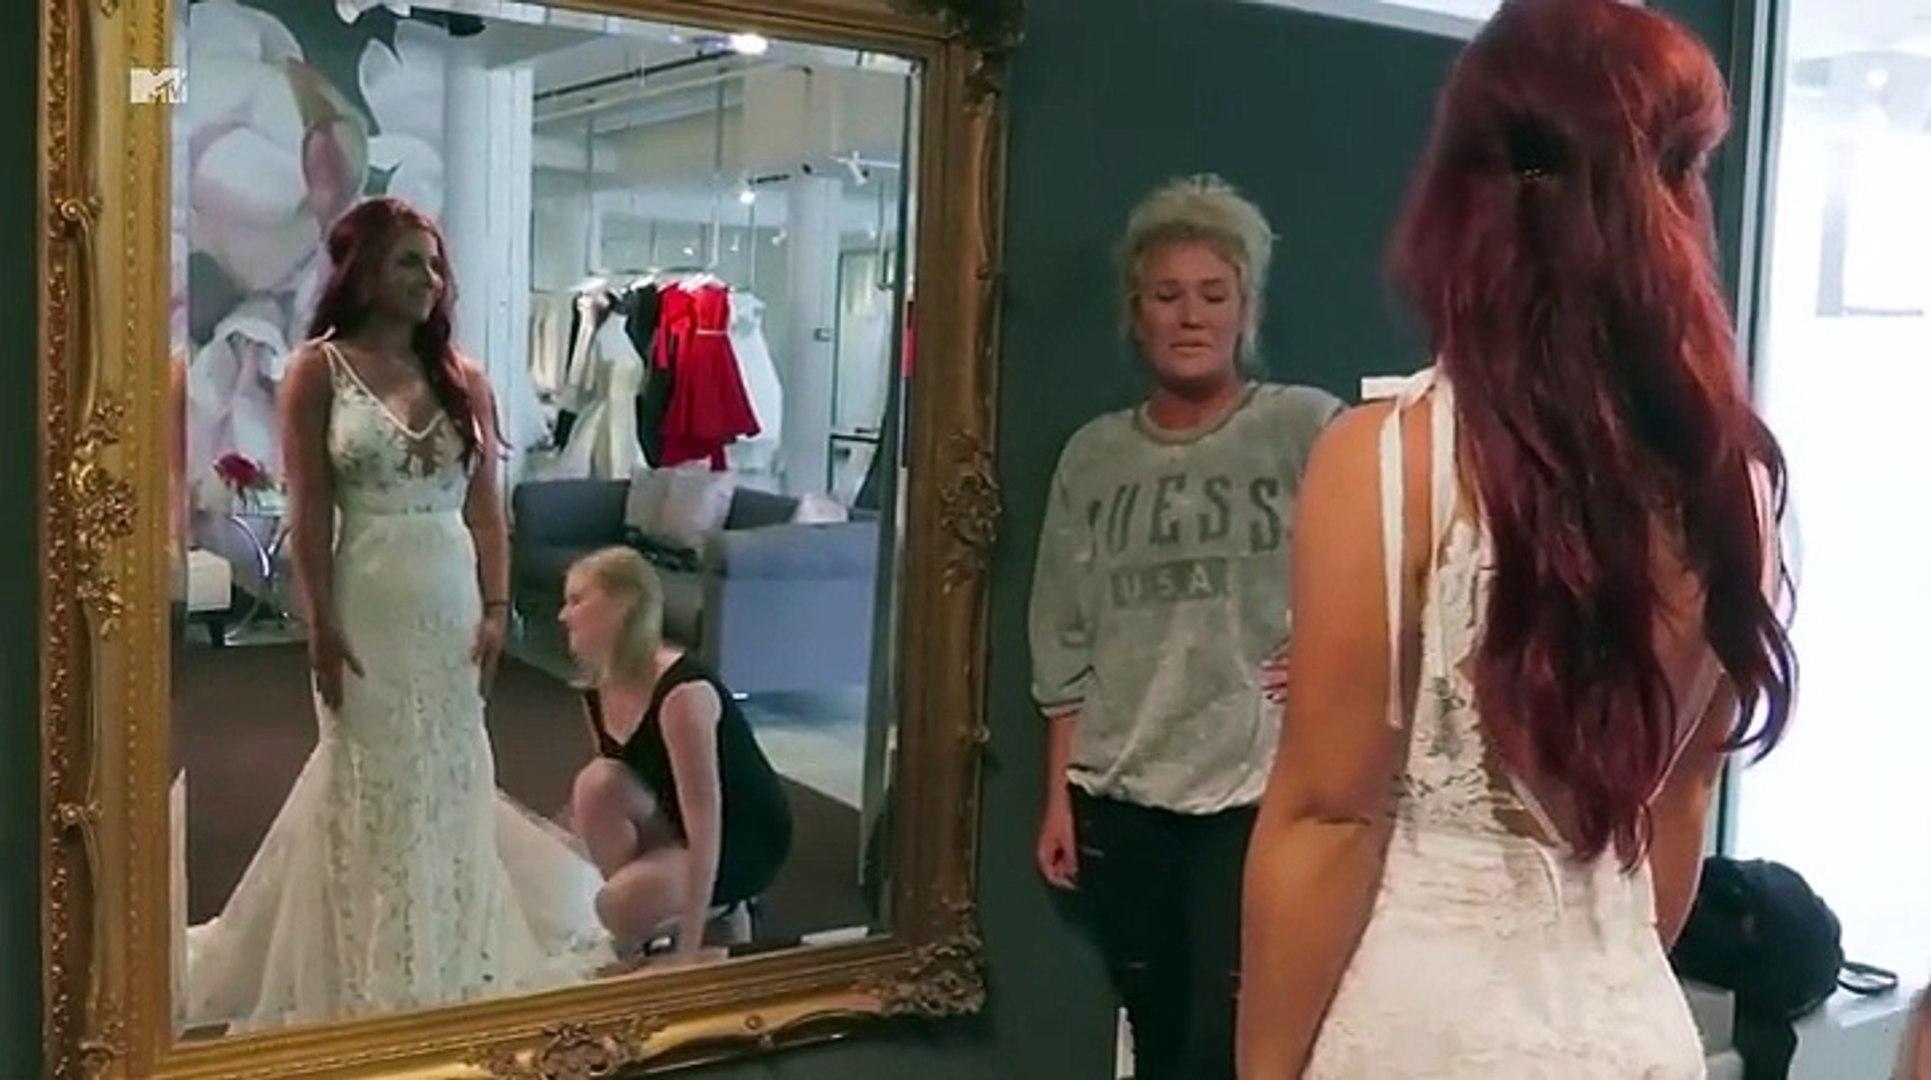 Chelsea Houska Wedding.Watch Chelsea Houska Try On Her Wedding Dress In This Stunning Never Before Seen Video